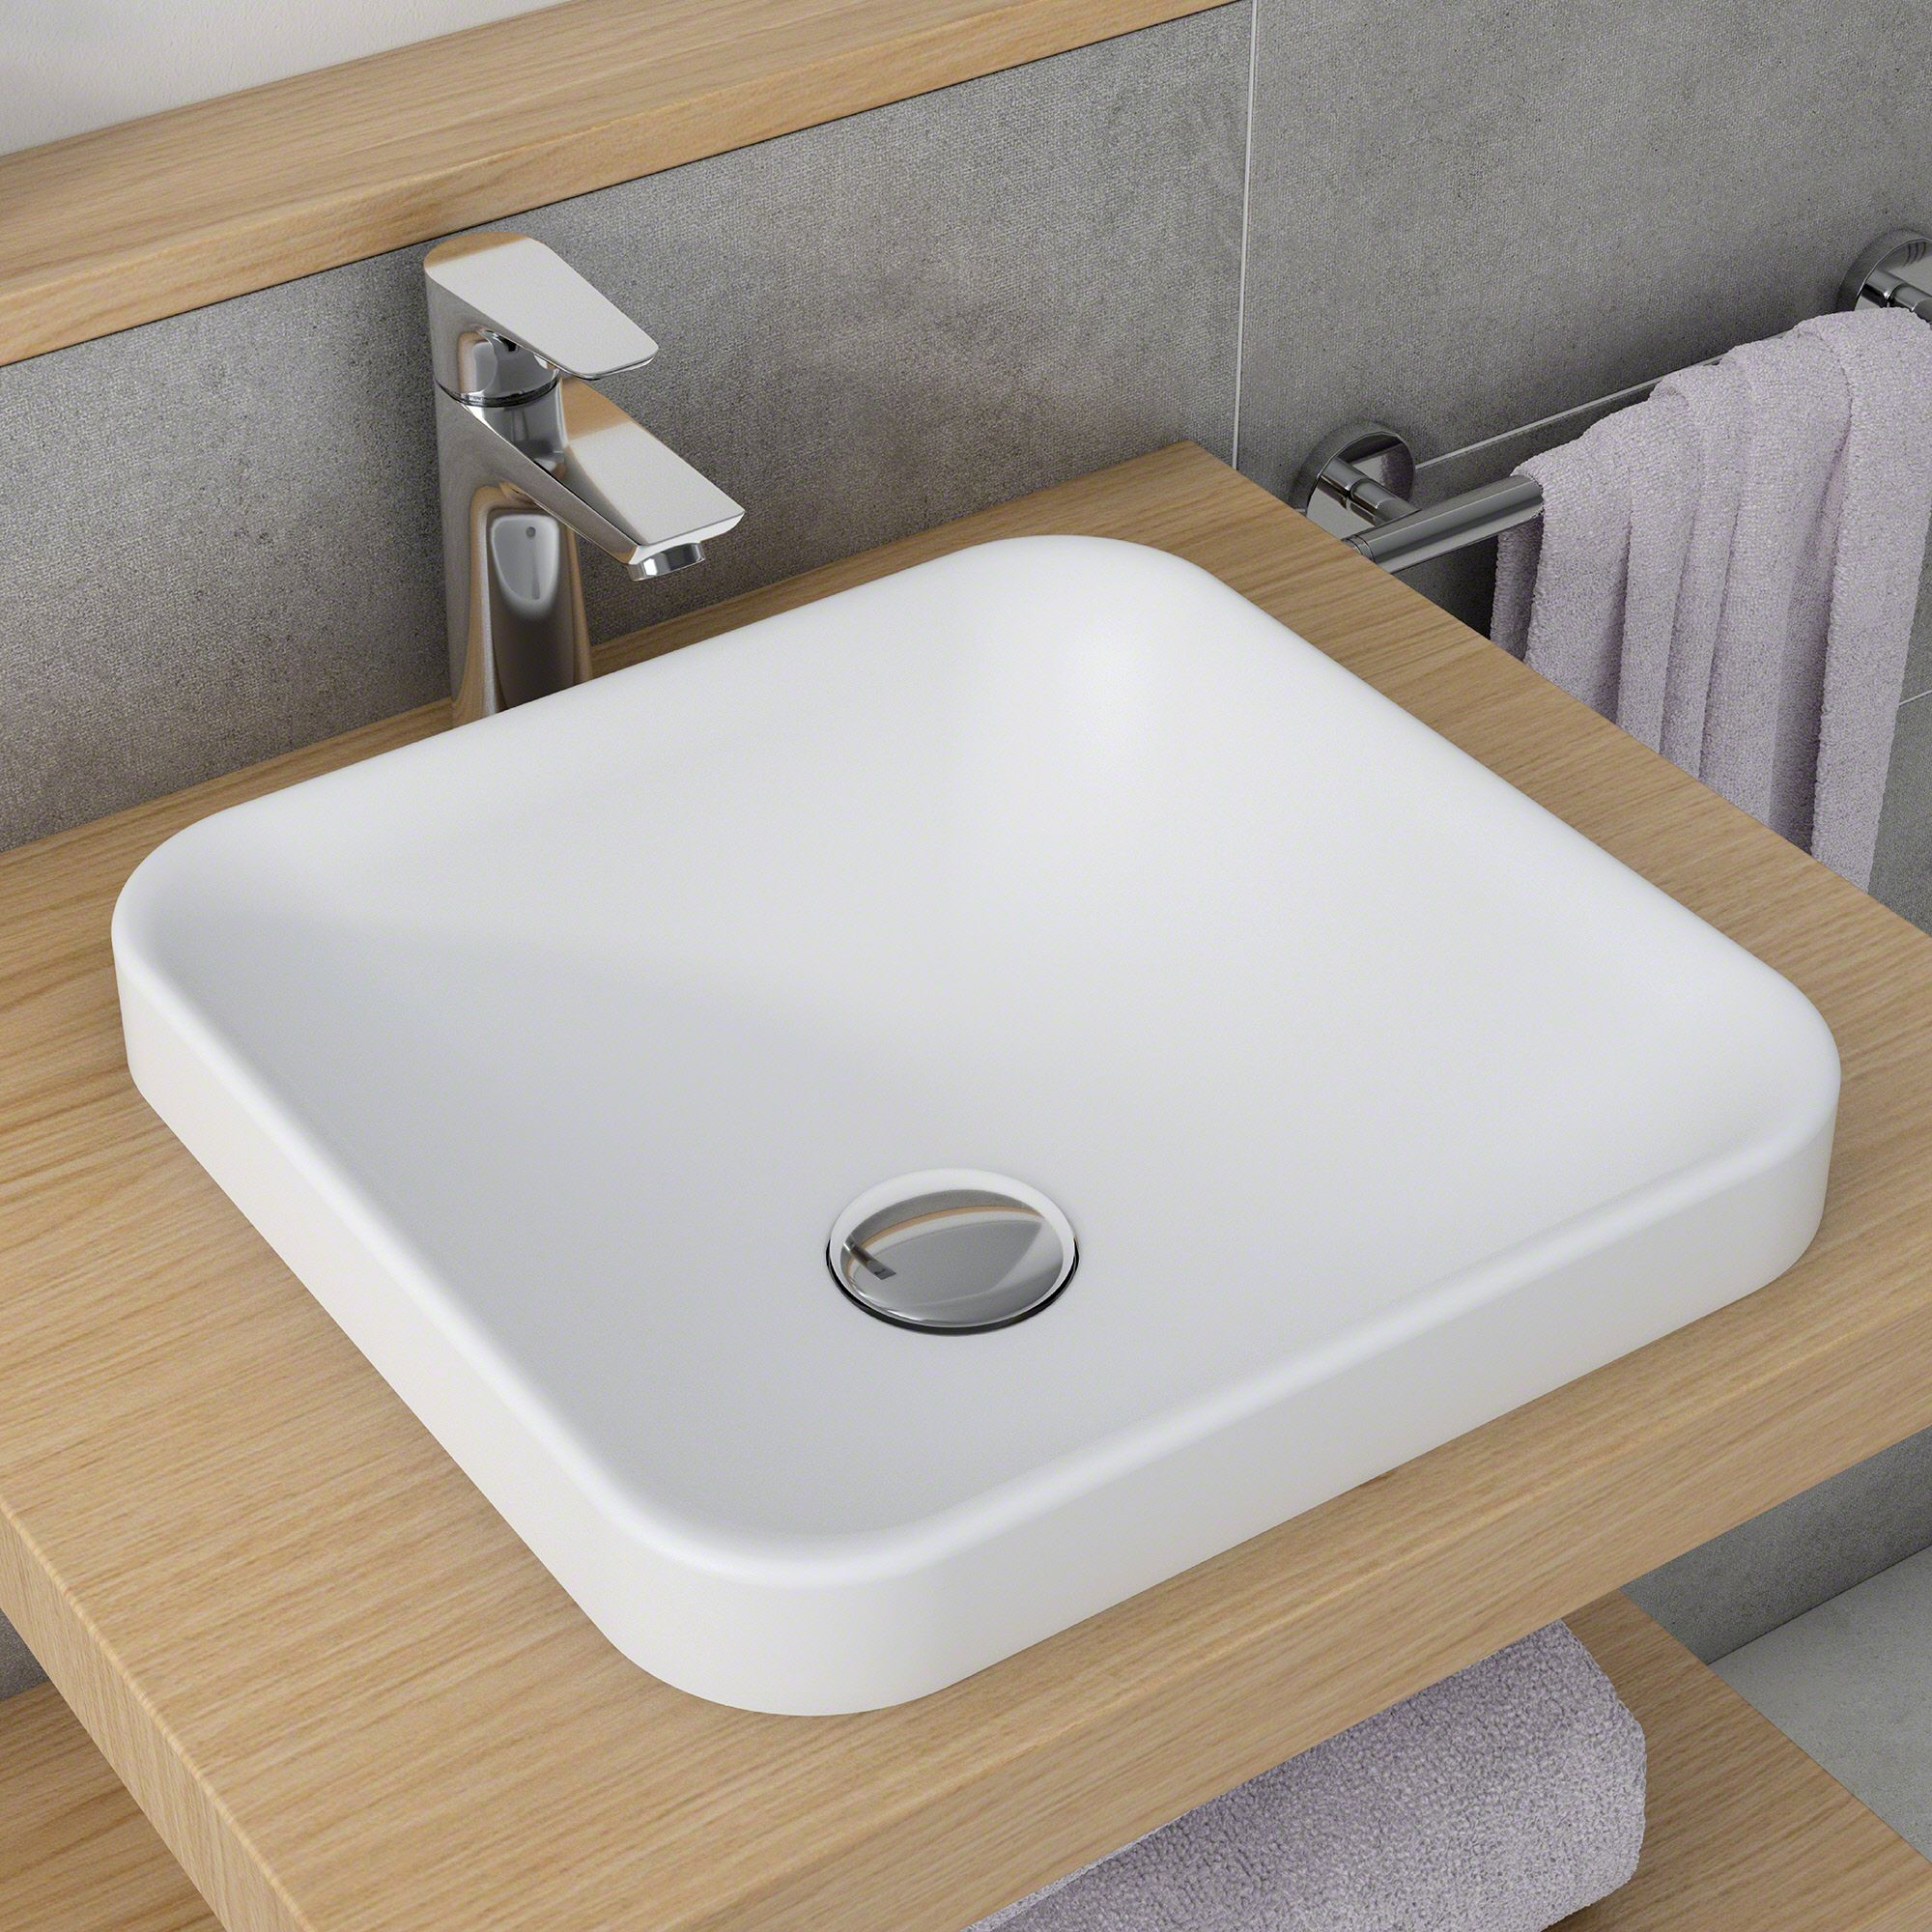 Home Improvement With Images Wood Bathroom Vanity Wood Bathroom